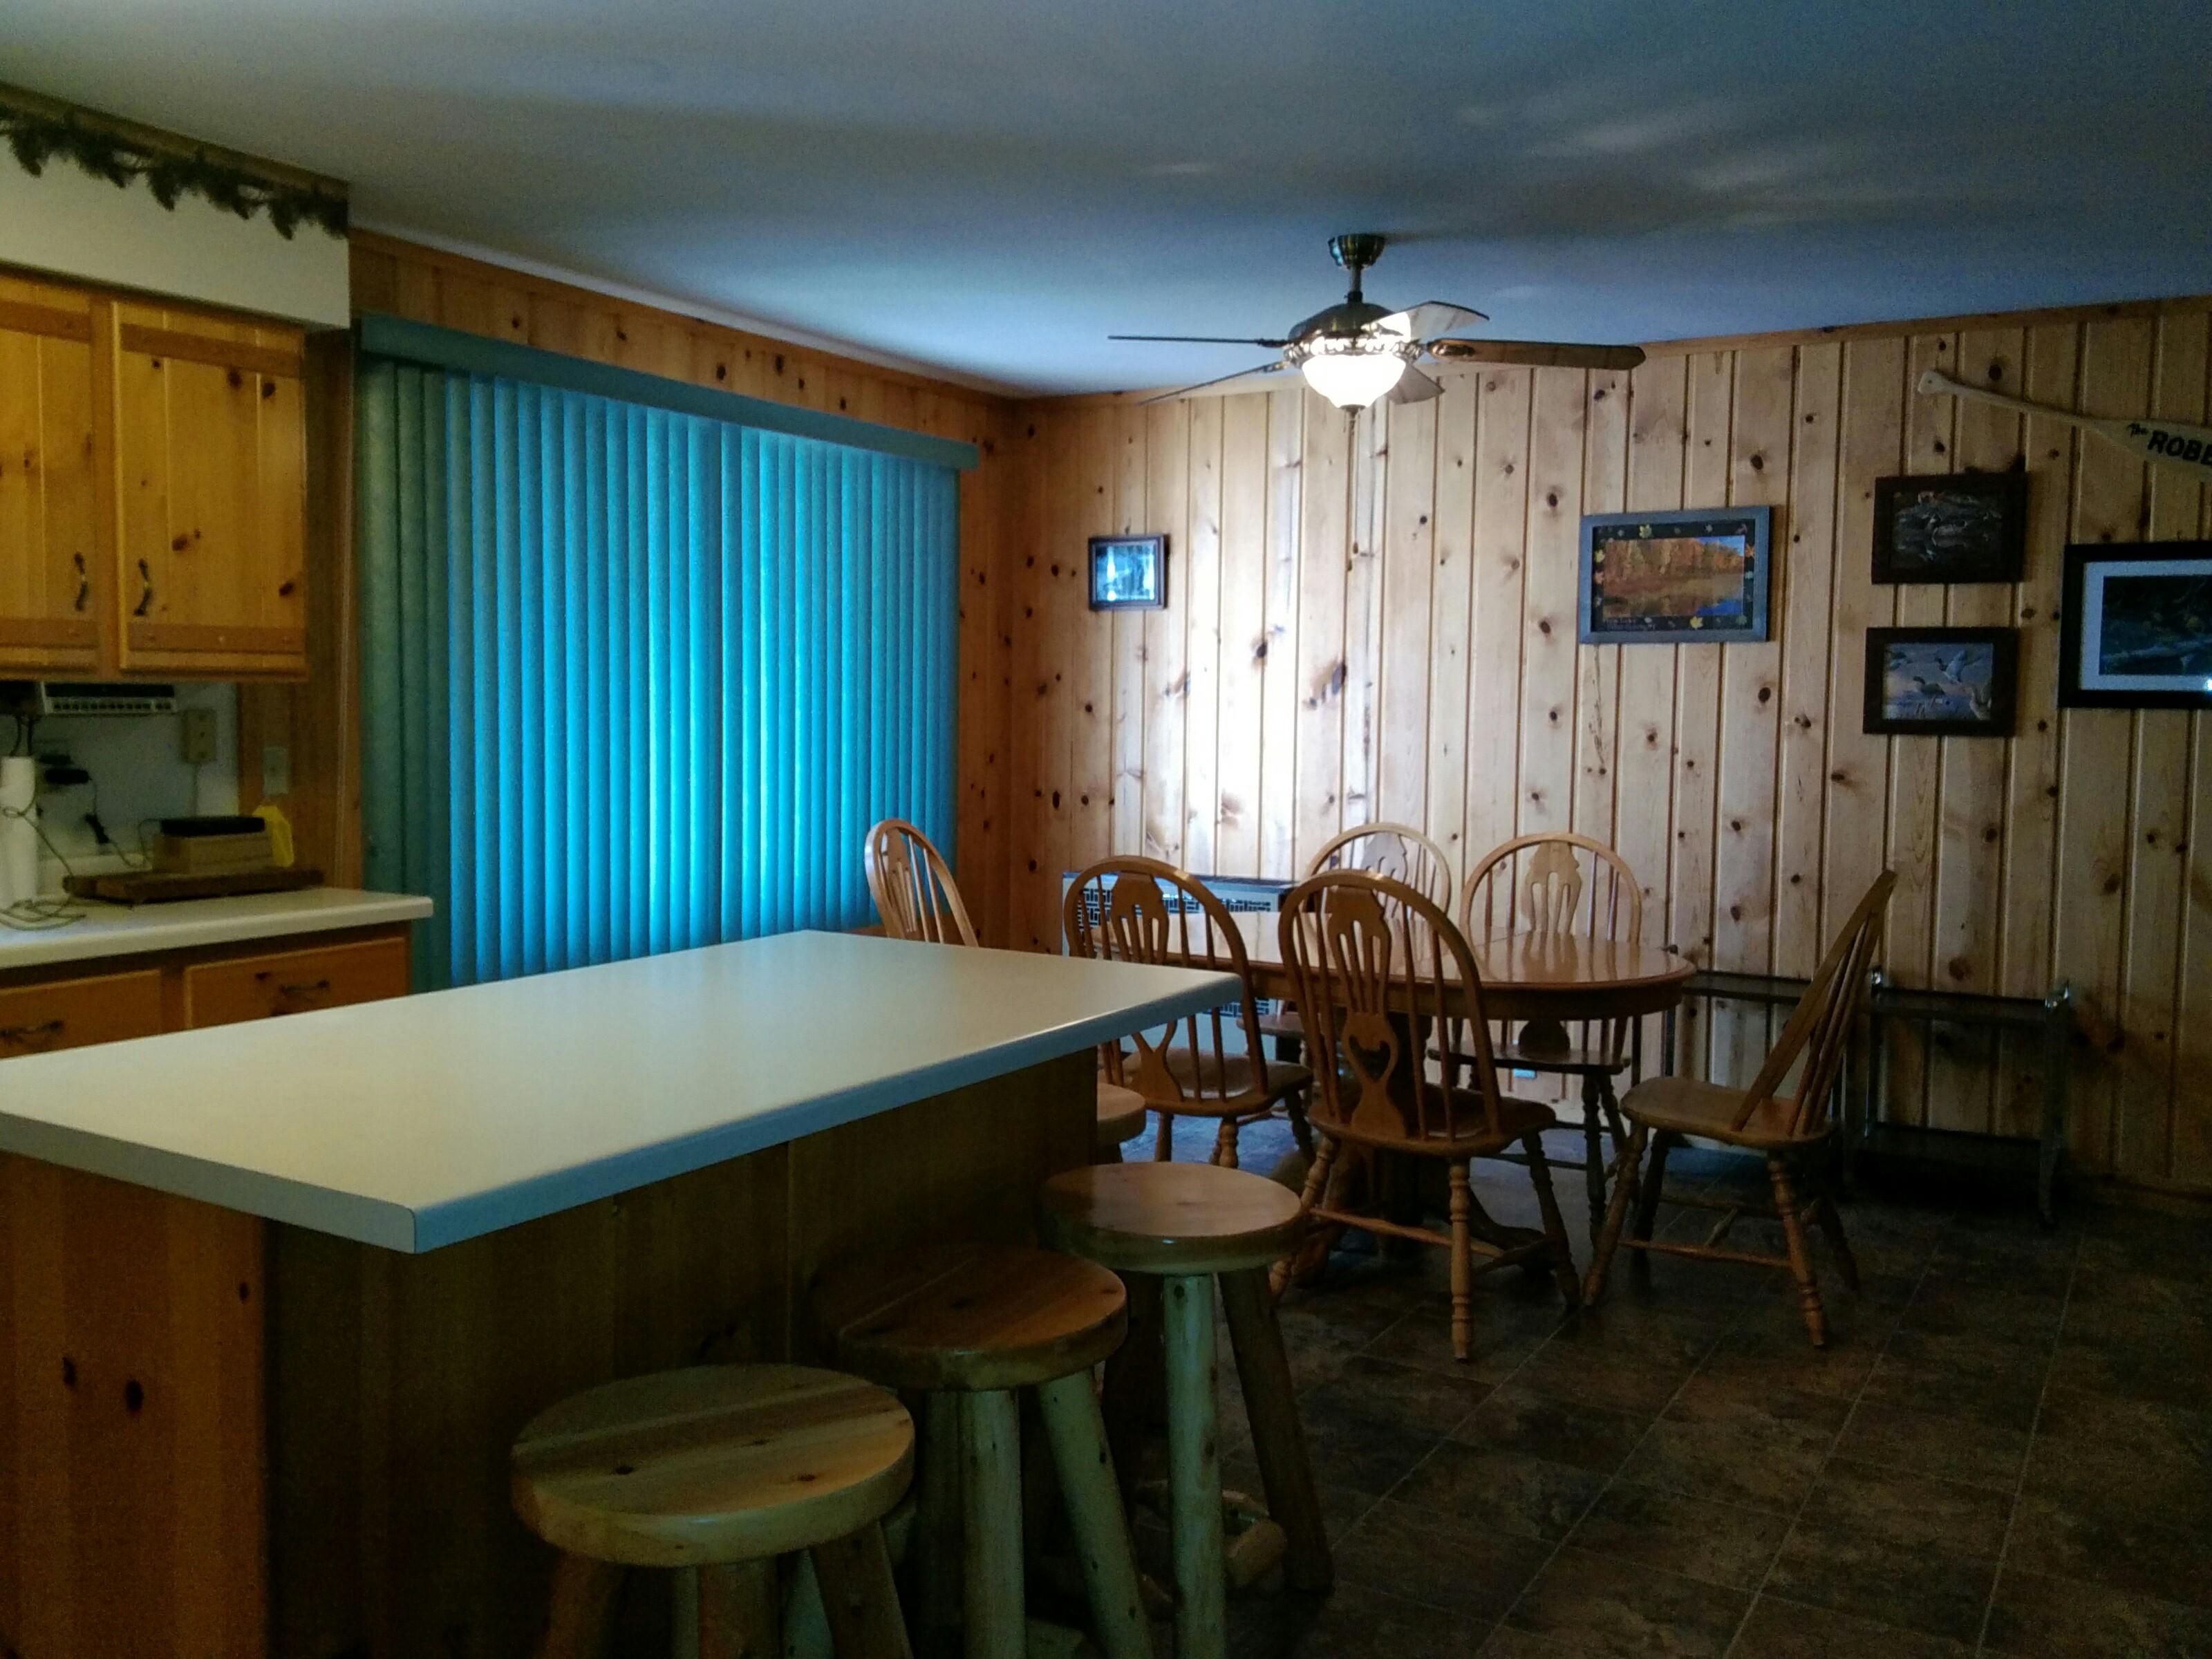 Cabin #24 (4 bedroom) – St. Germain Lodge